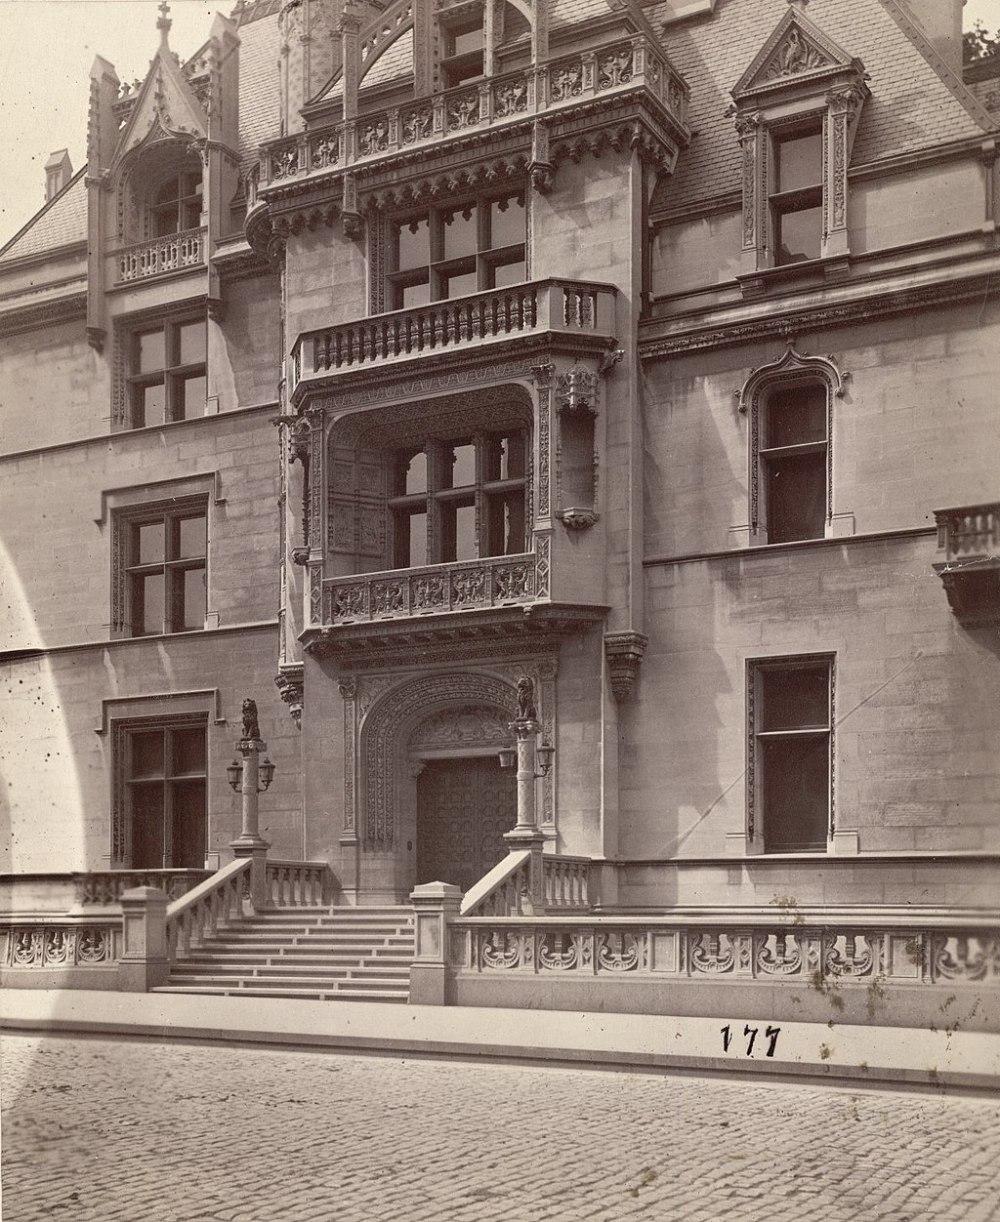 William K. Vanderbilt Residence, New York City